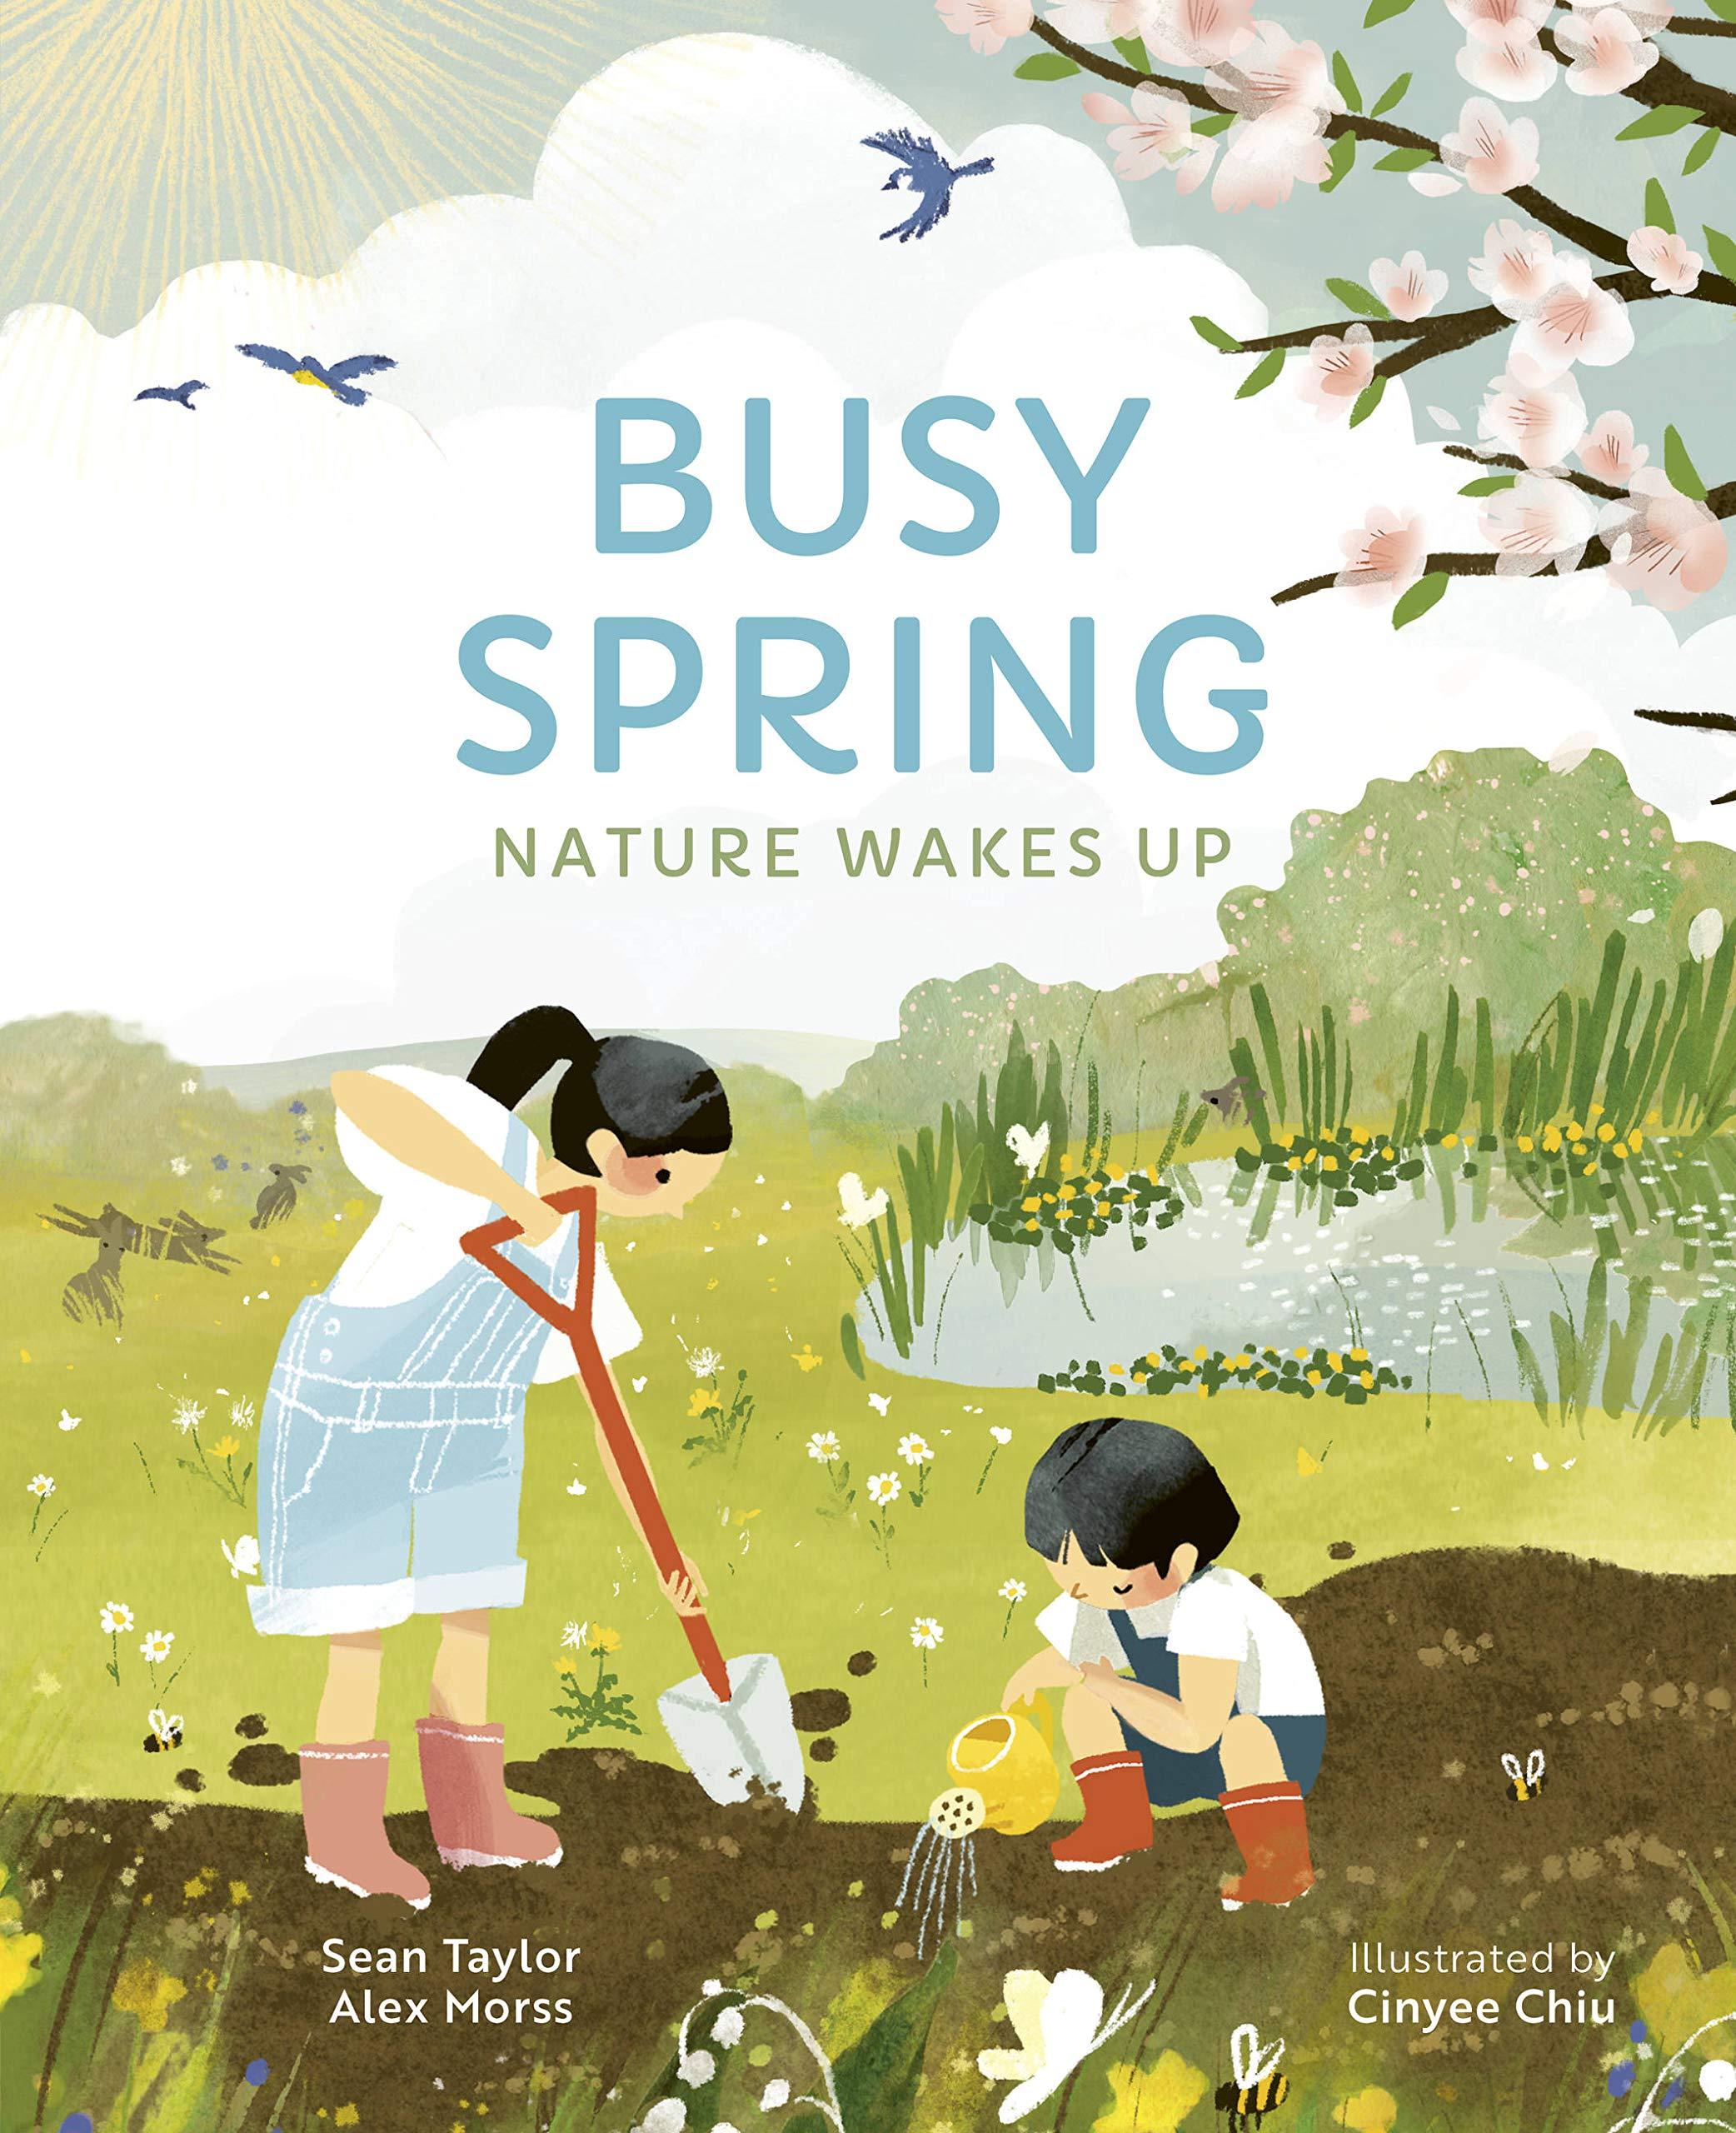 Amazon.com: Busy Spring: Nature Wakes Up (9780711255395): Taylor, Sean,  Morss, Alex, Chiu, Cinyee: Books